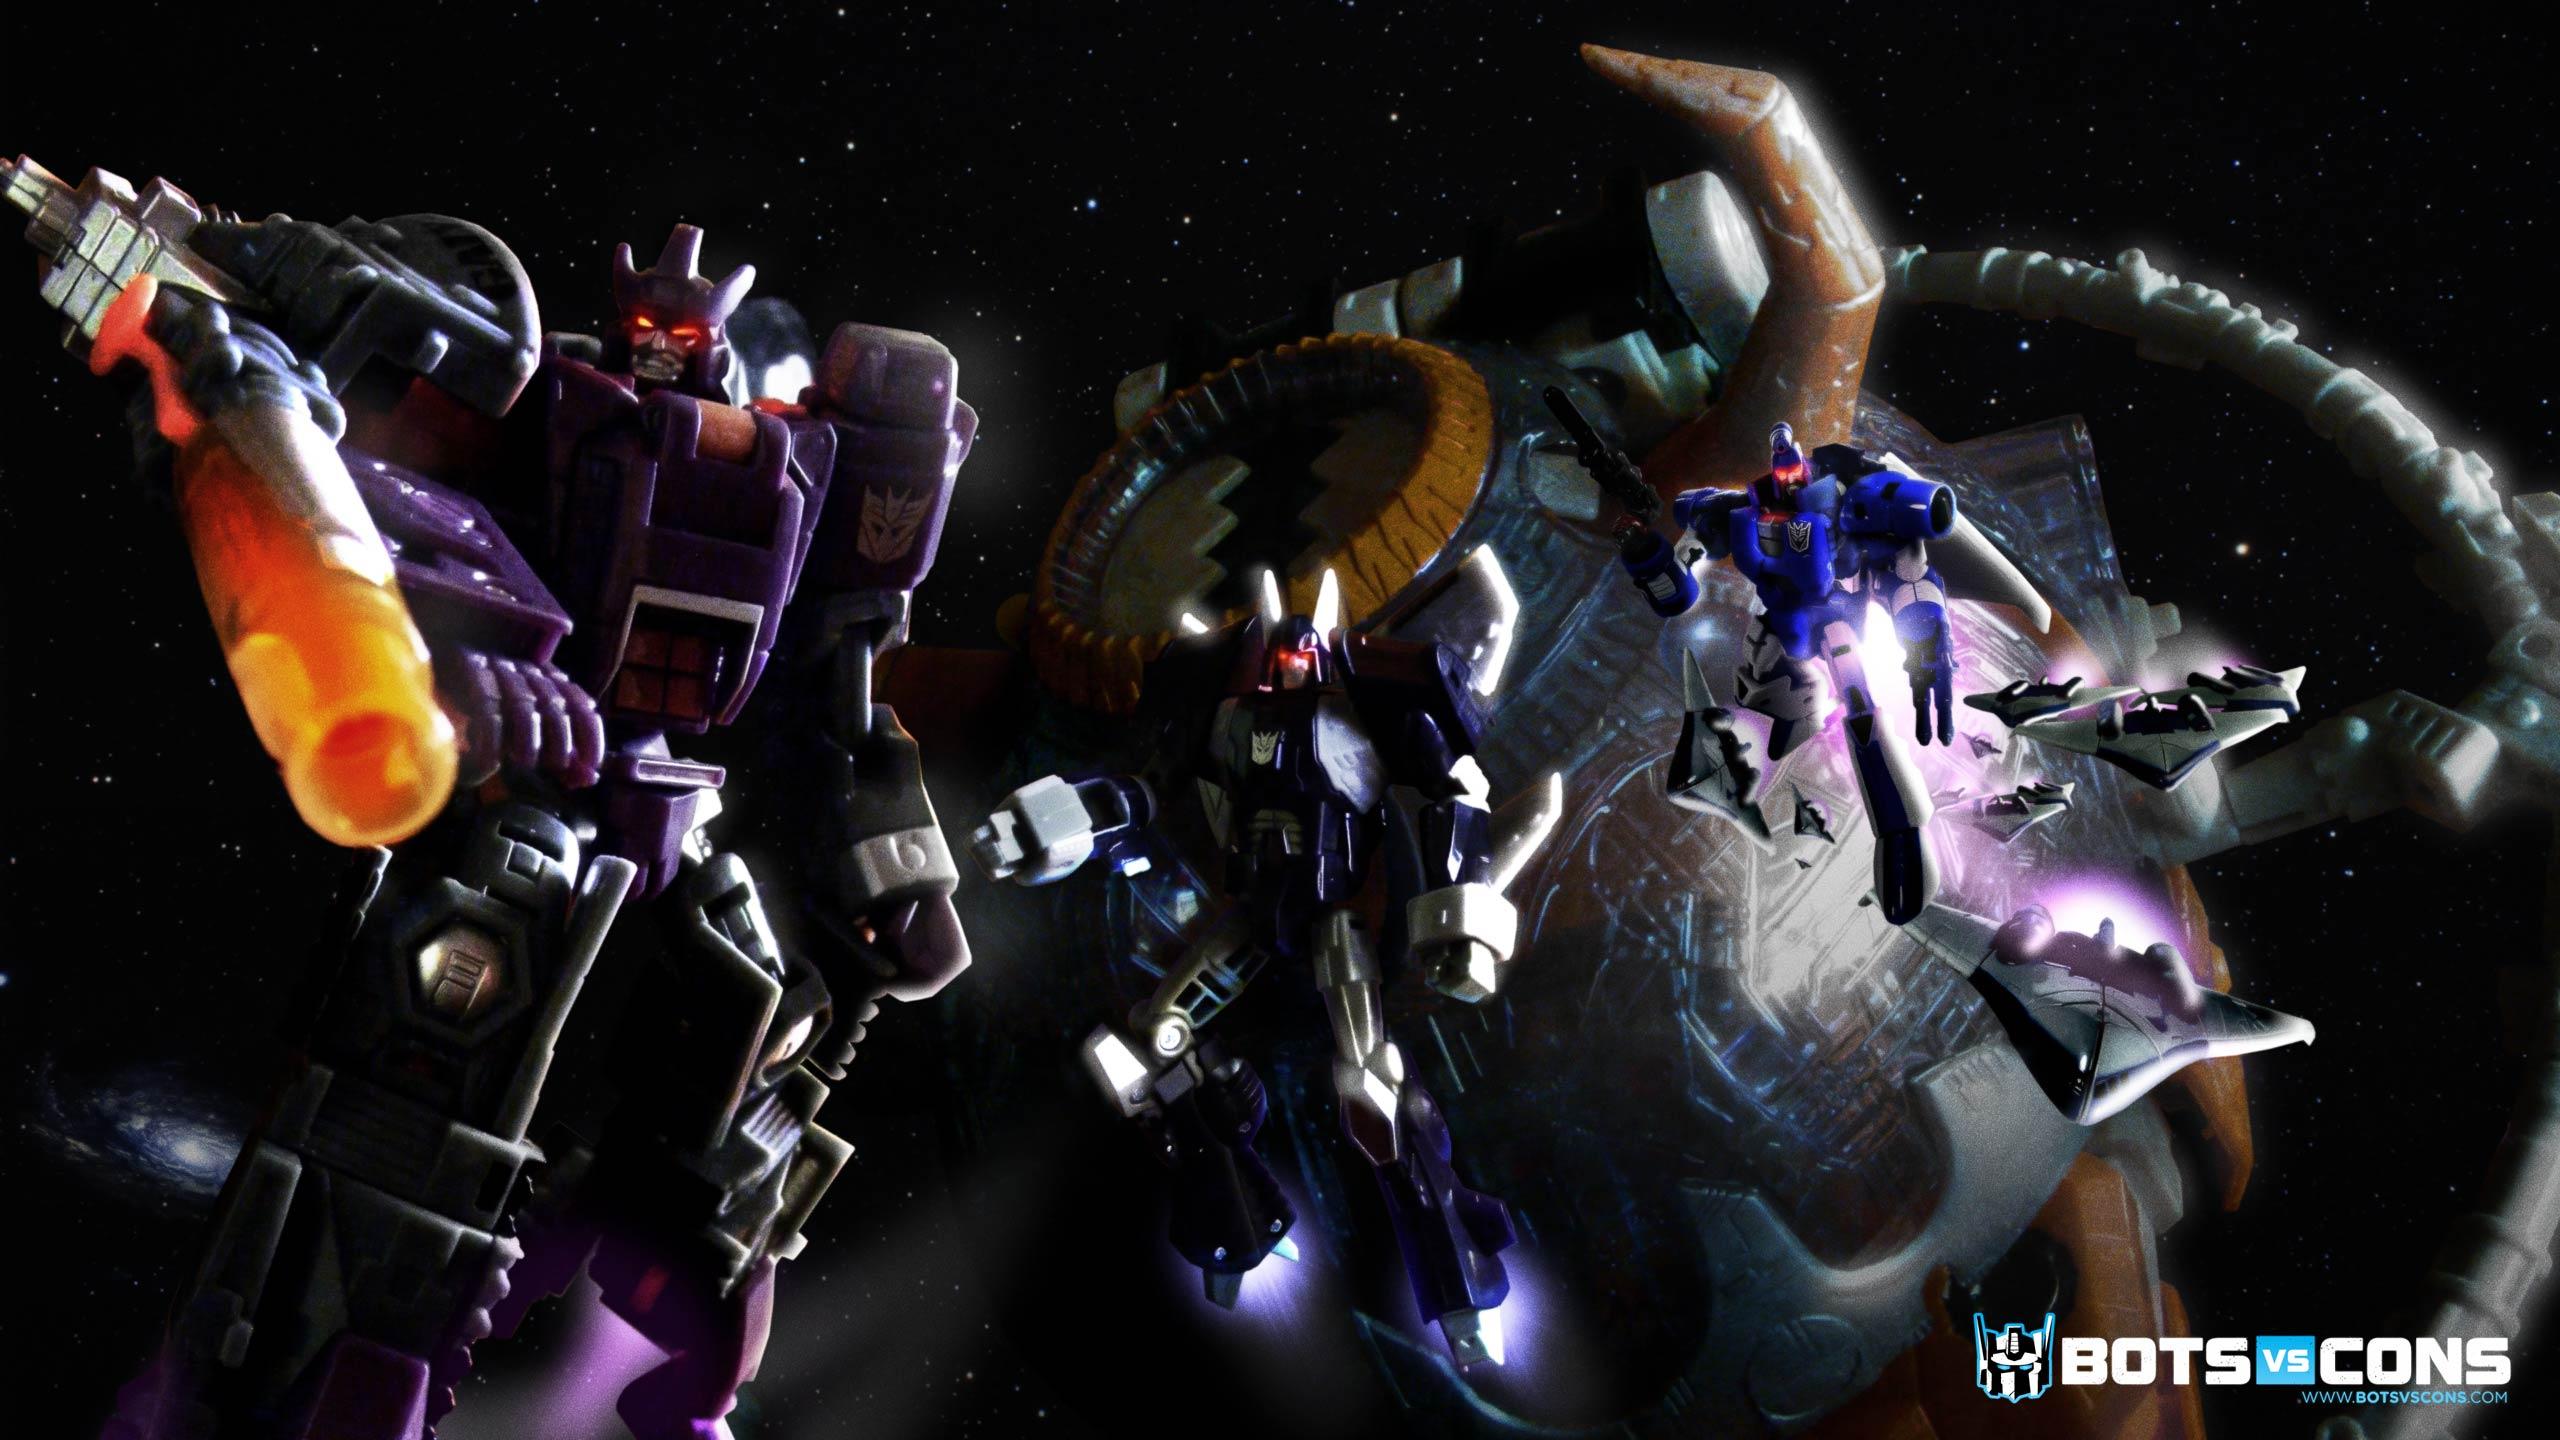 Behold Galvatron Transformers Wallpaper